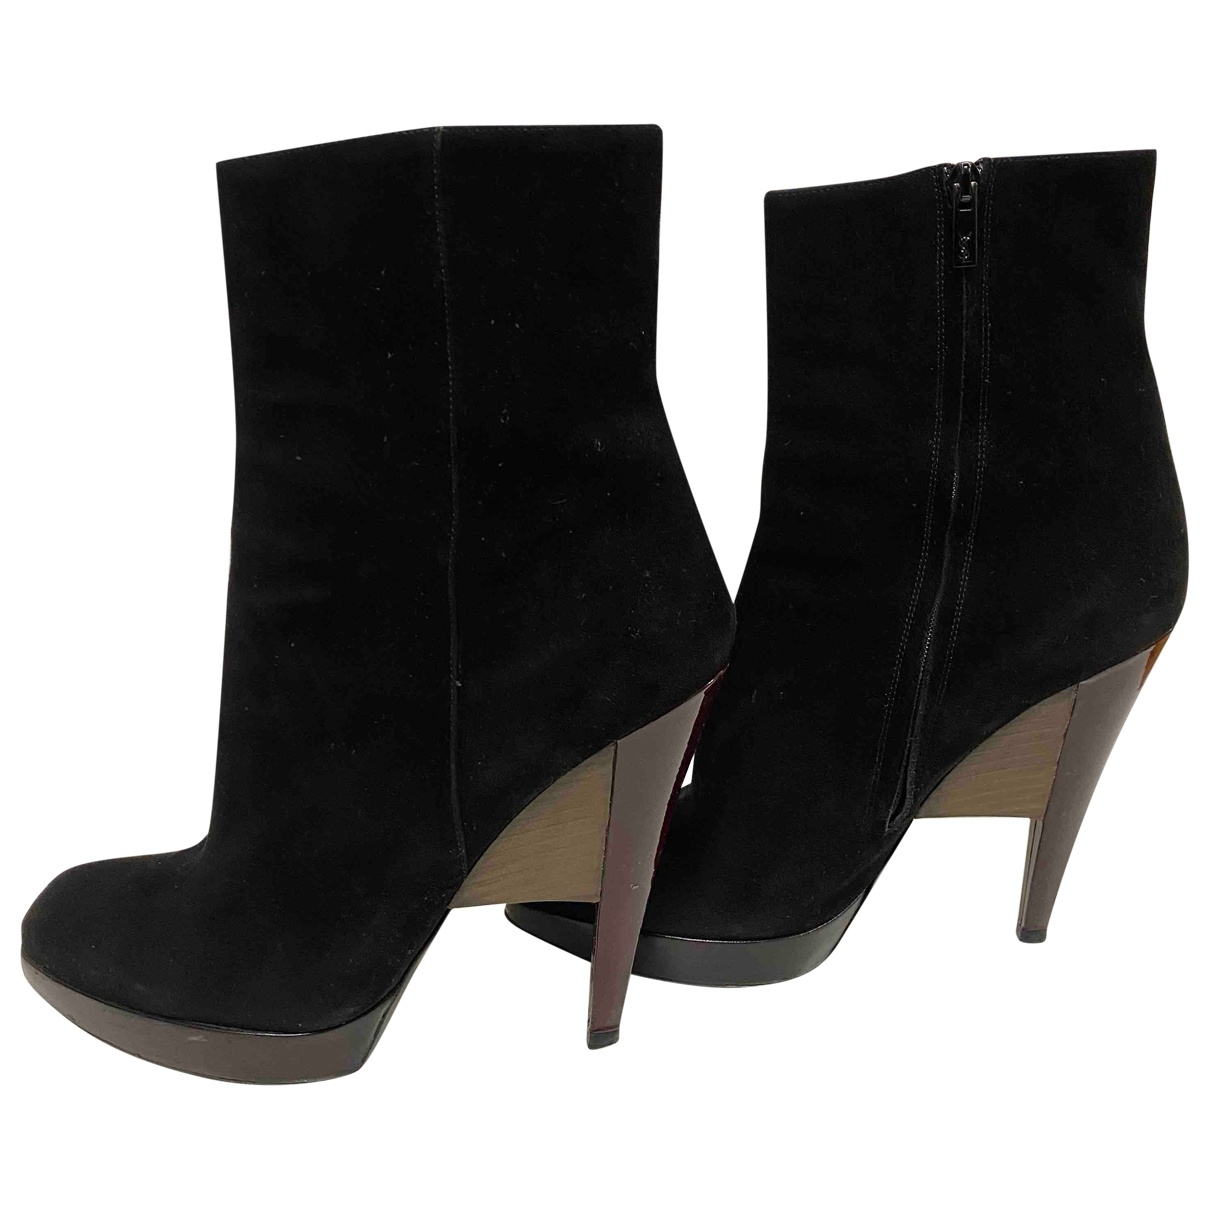 Yves Saint Laurent \N Black Suede Ankle boots for Women 41 EU